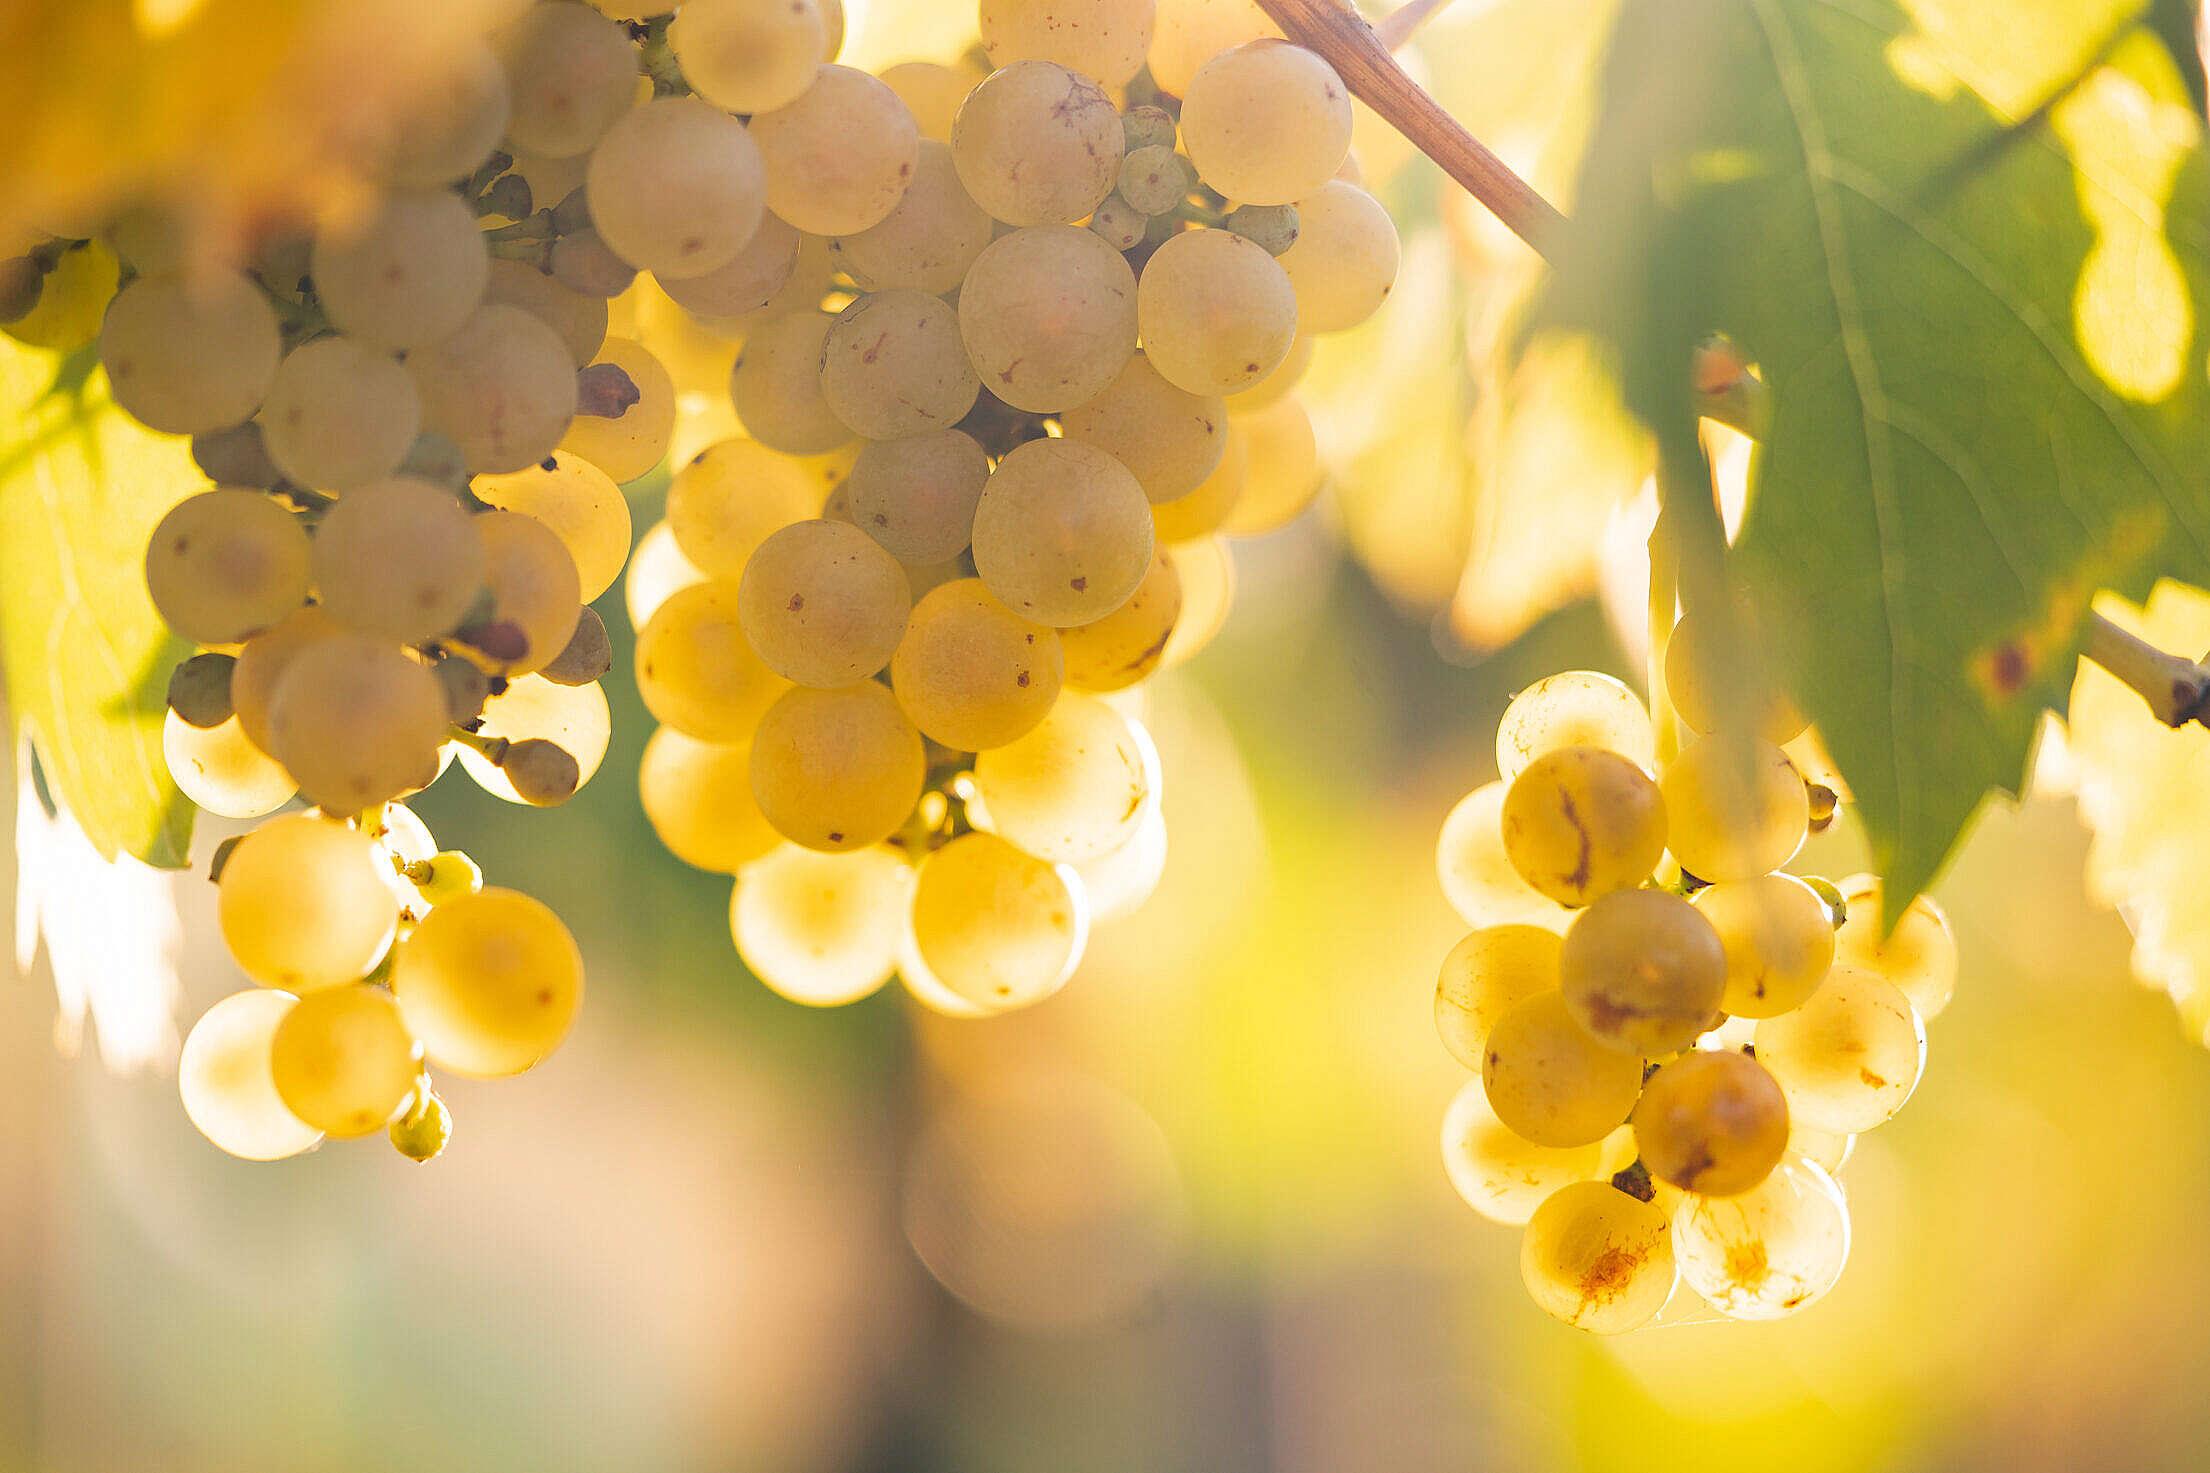 White Grapes in Vineyard Free Stock Photo